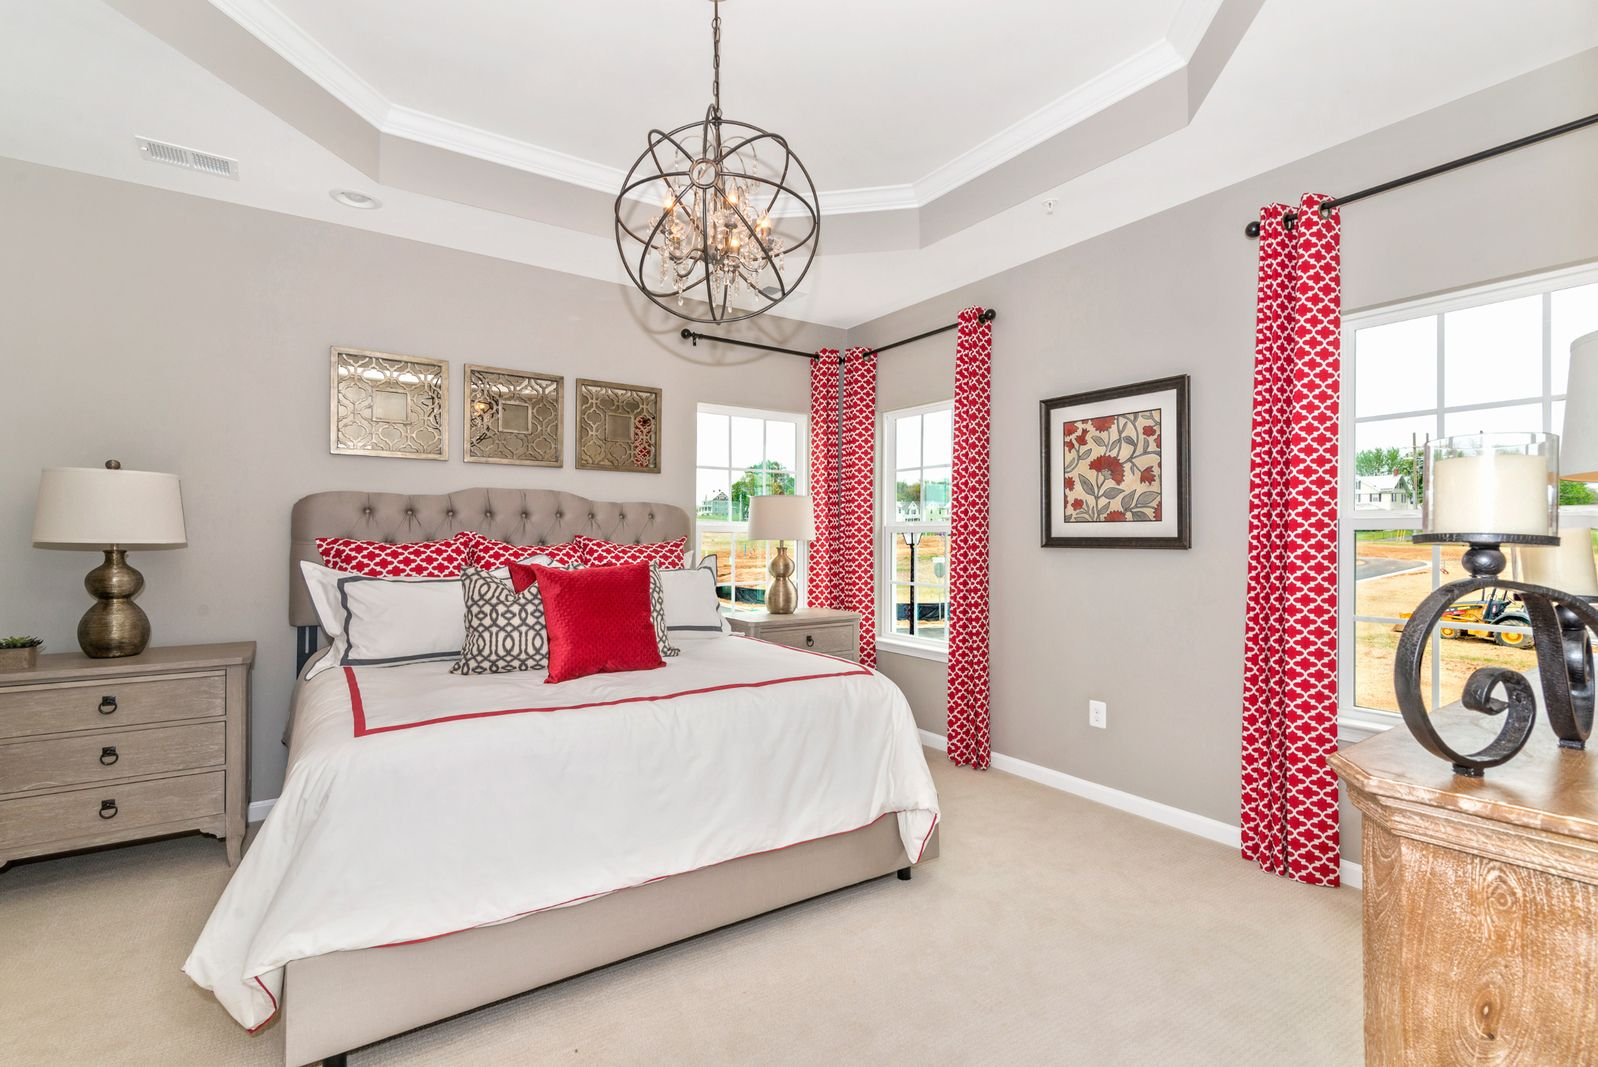 Bedroom featured in the Ernest Hemingway By Ryan Homes in Norfolk-Newport News, VA